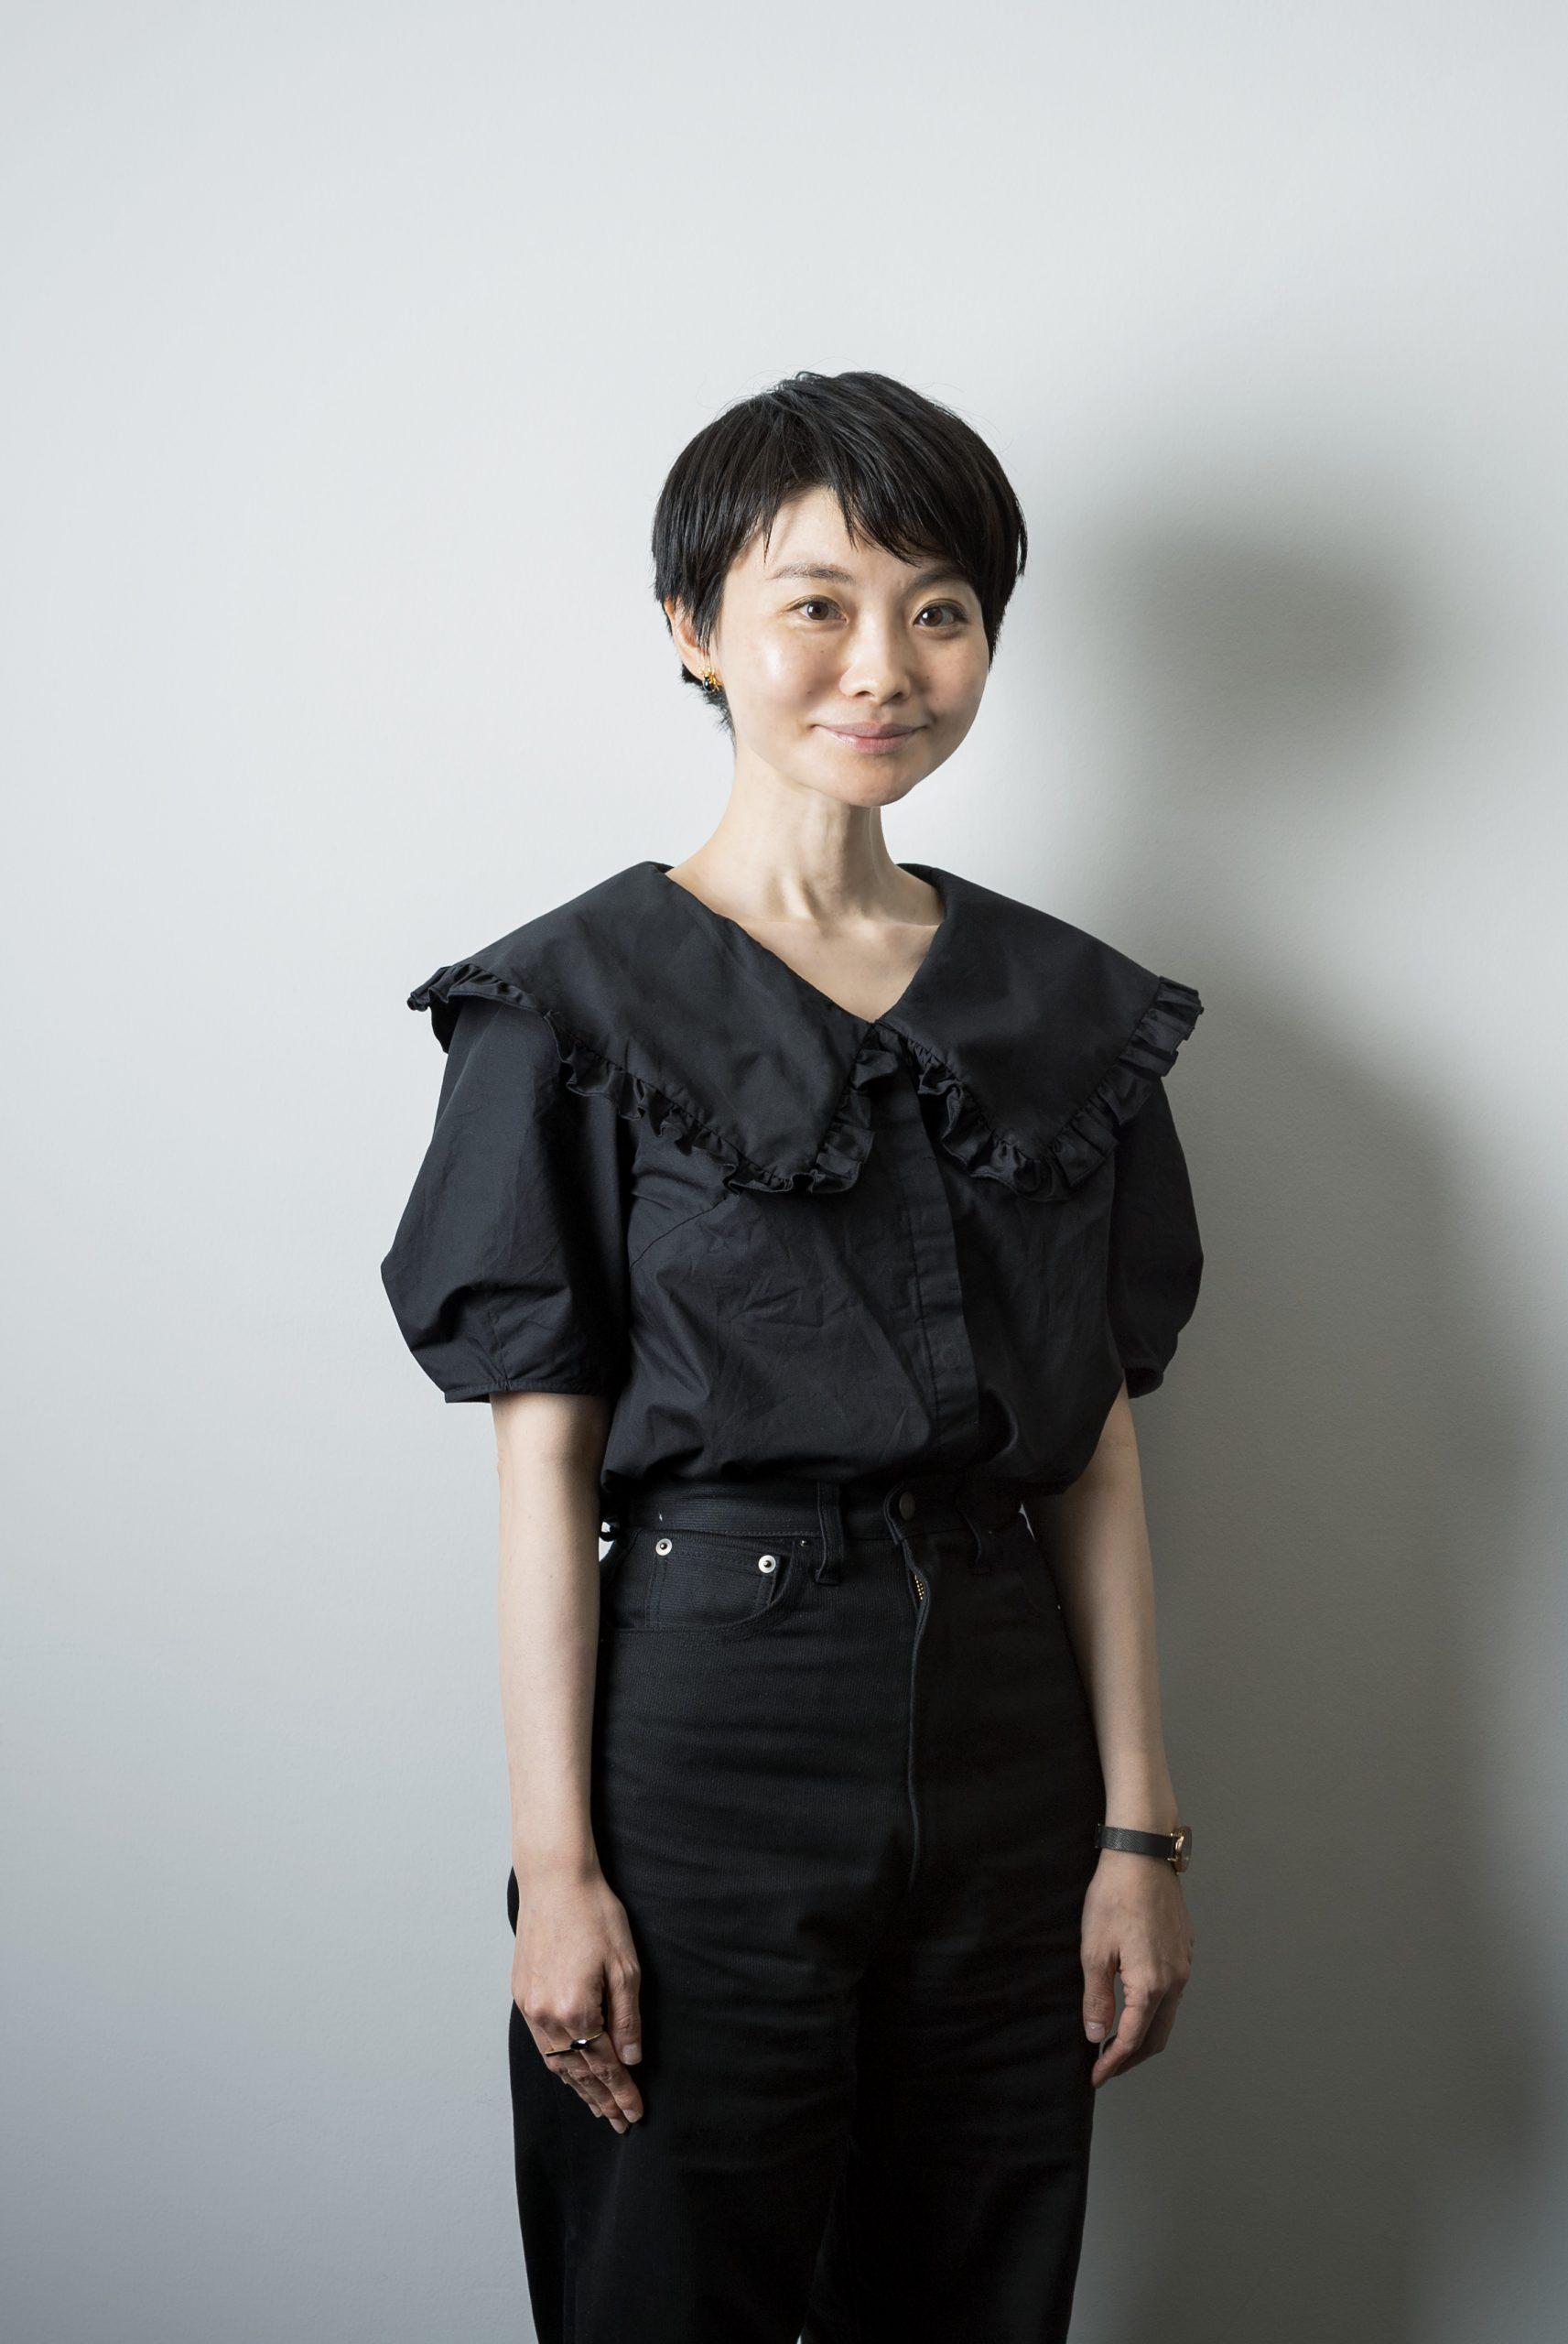 Kaori Fujino